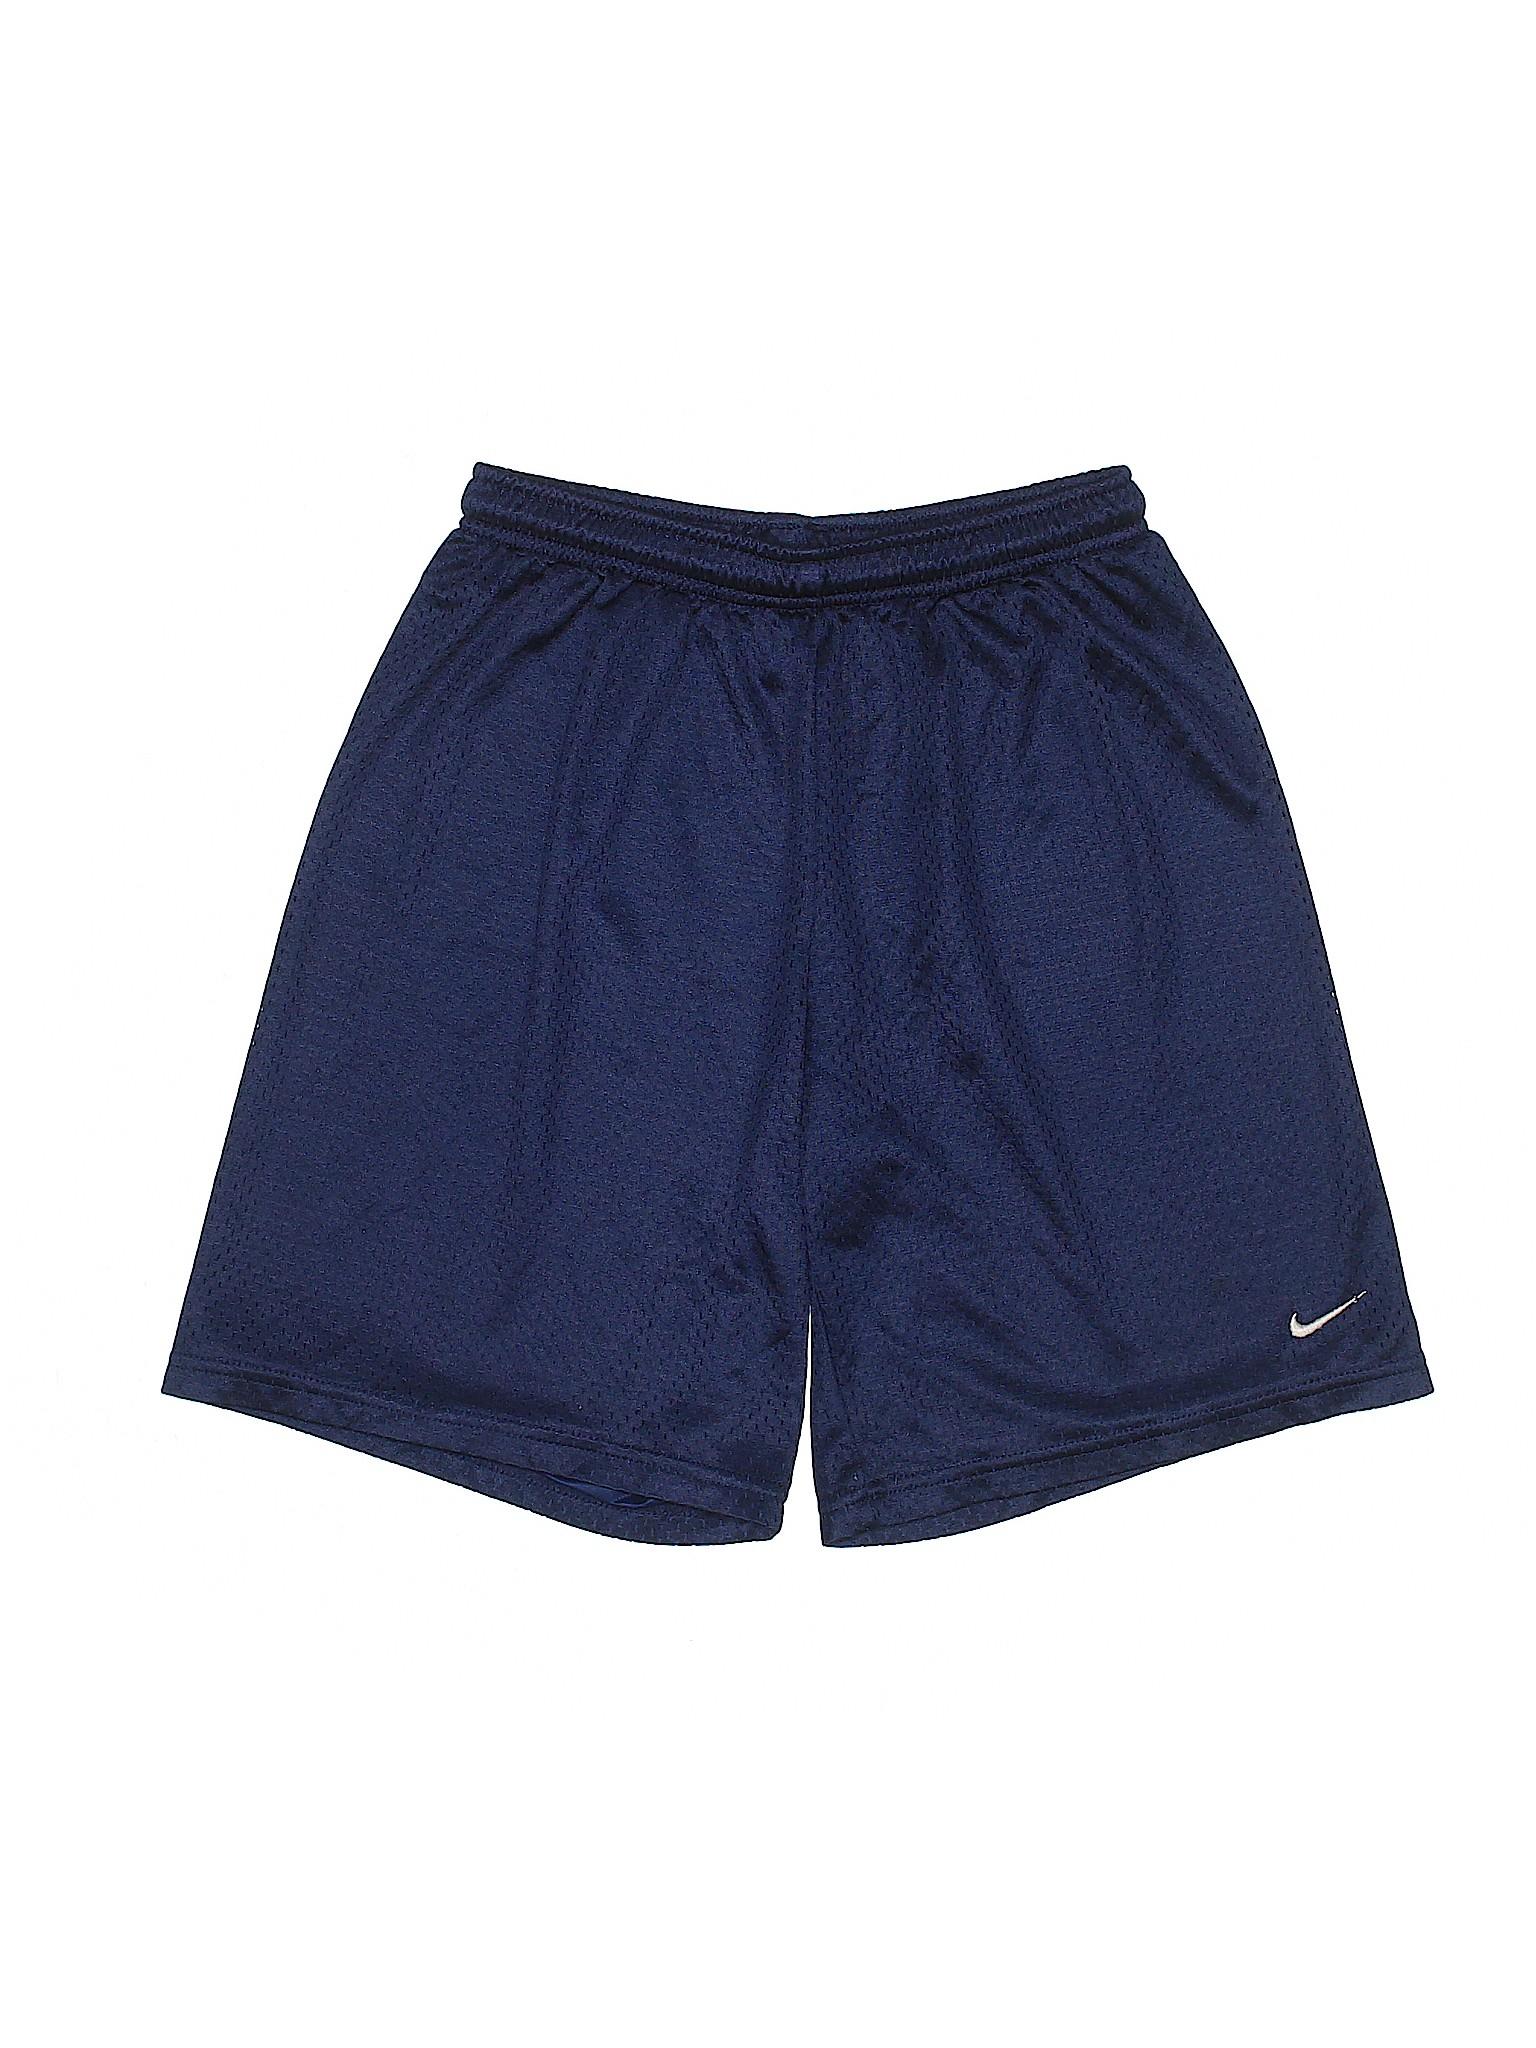 Boutique Shorts Nike Athletic Shorts Athletic Nike Boutique rRzxqFArw6